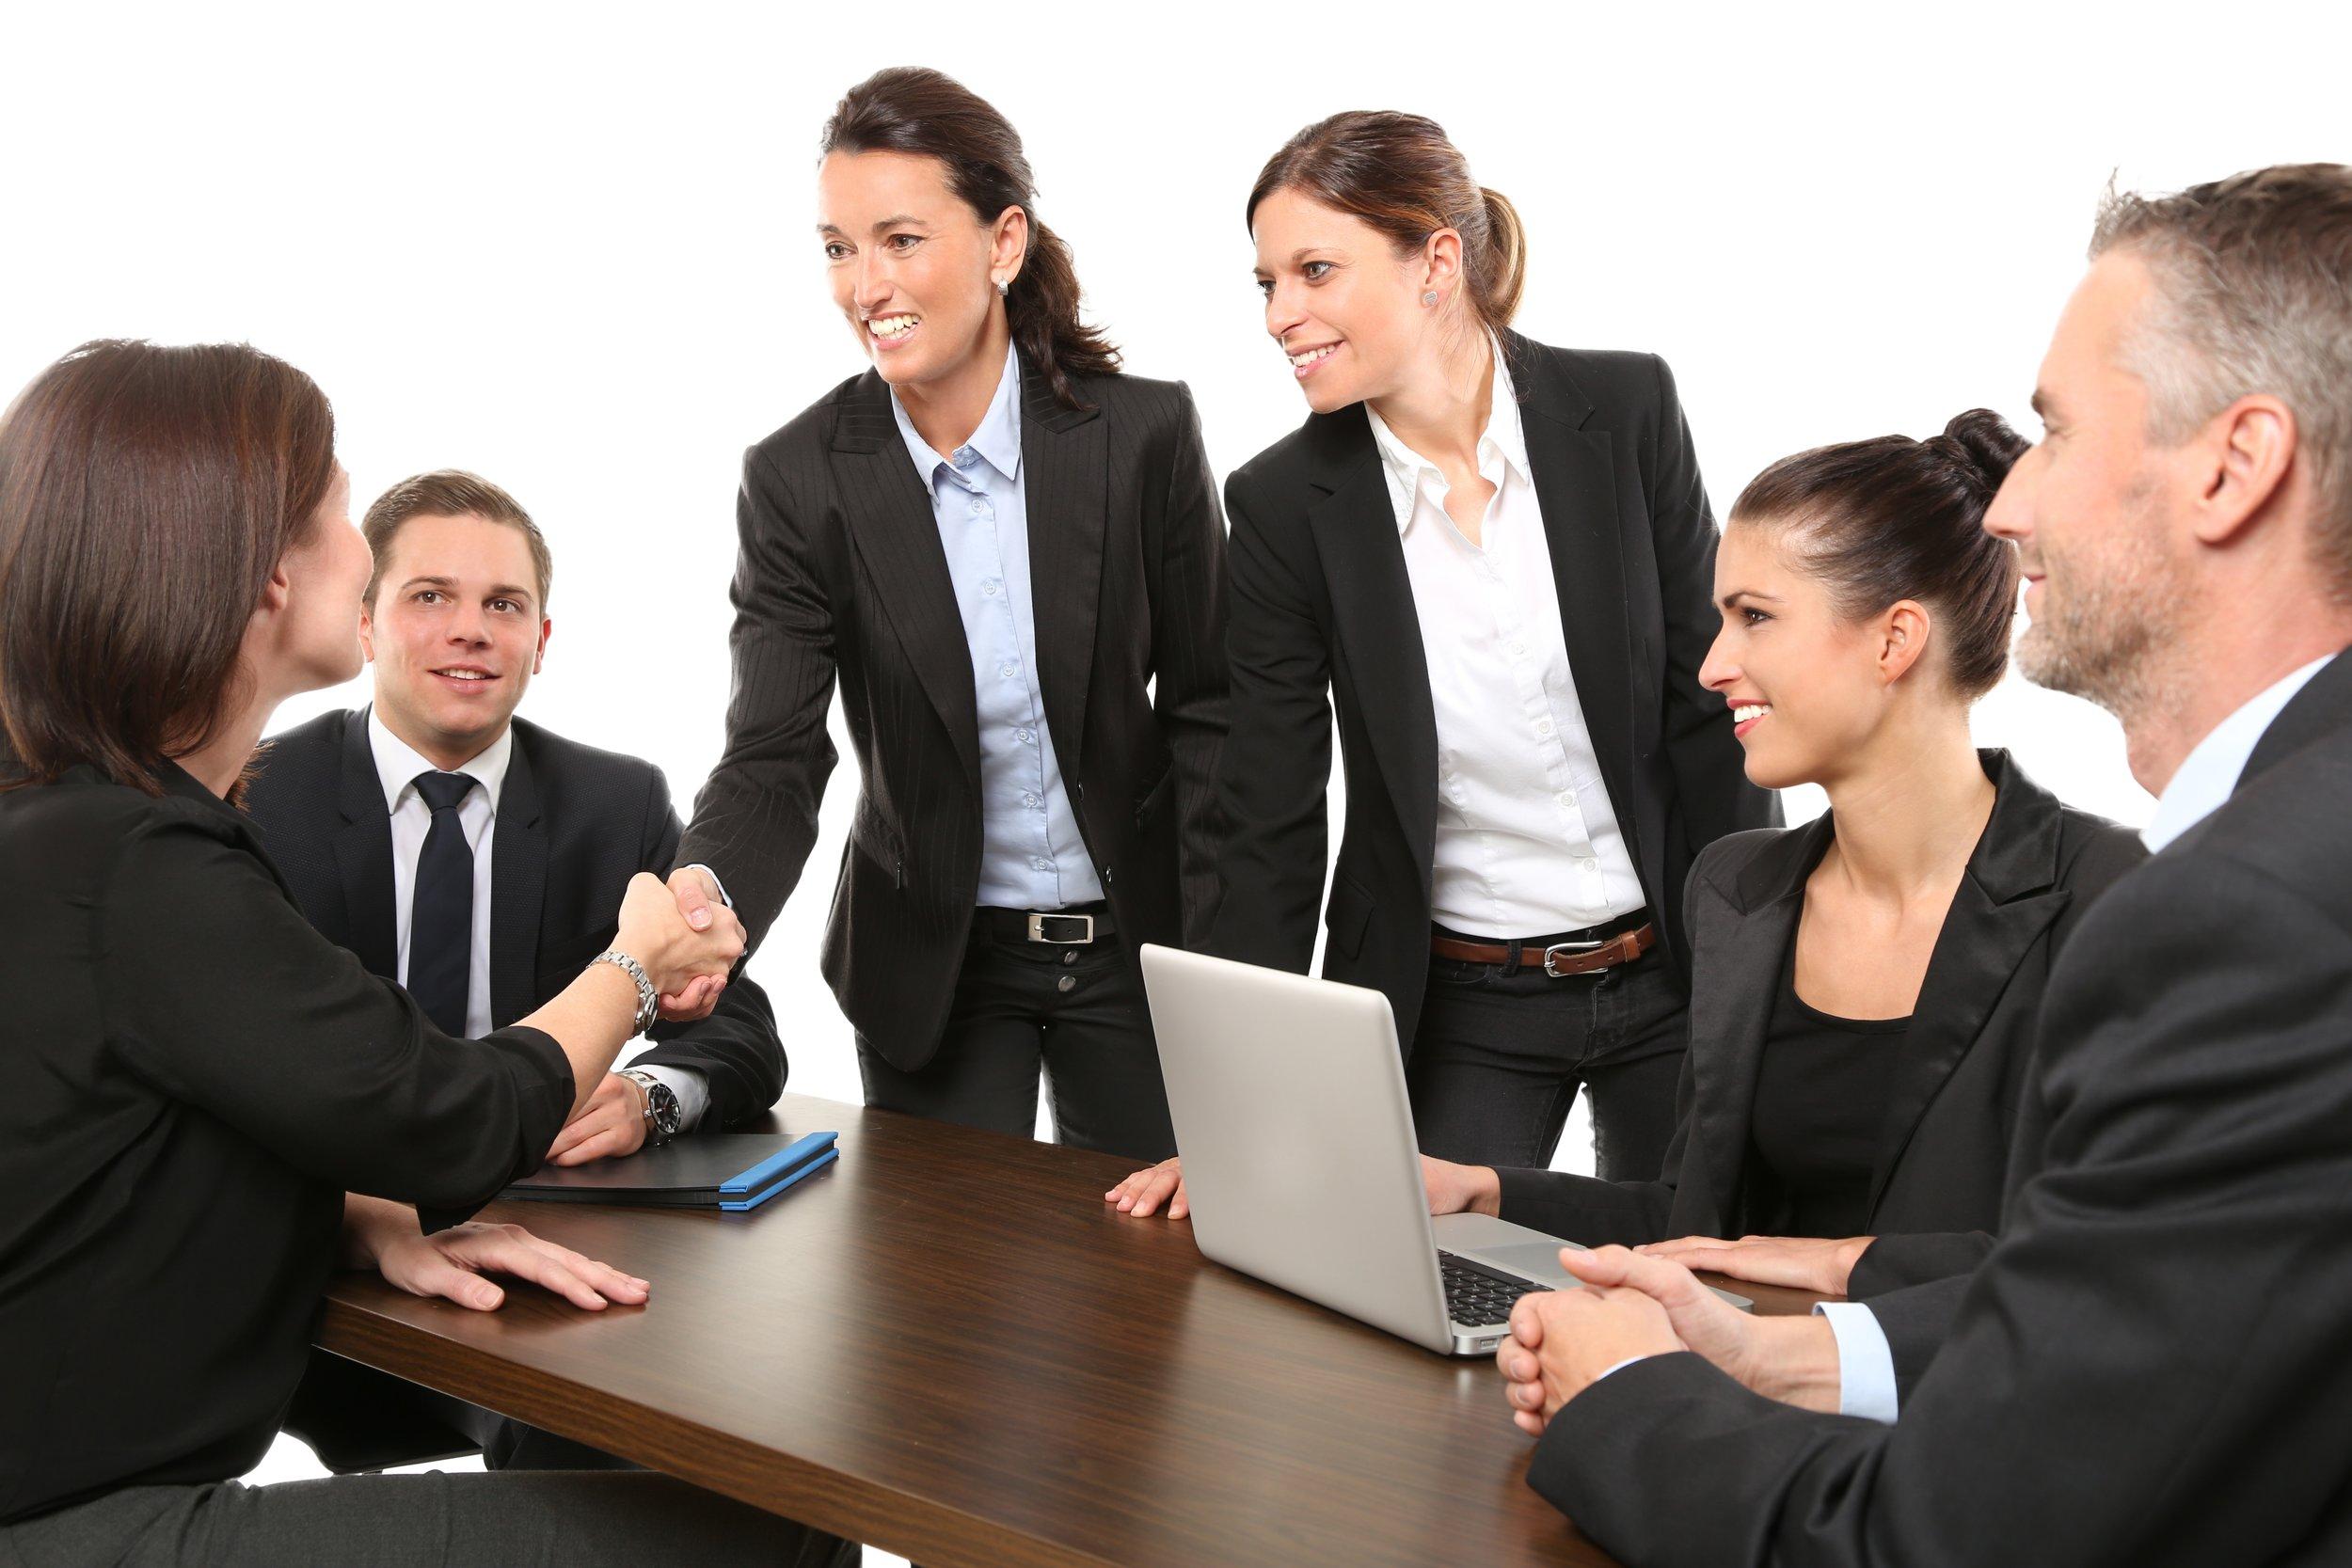 desk-computer-work-suit-group-meeting-1282006-pxhere.com.jpg